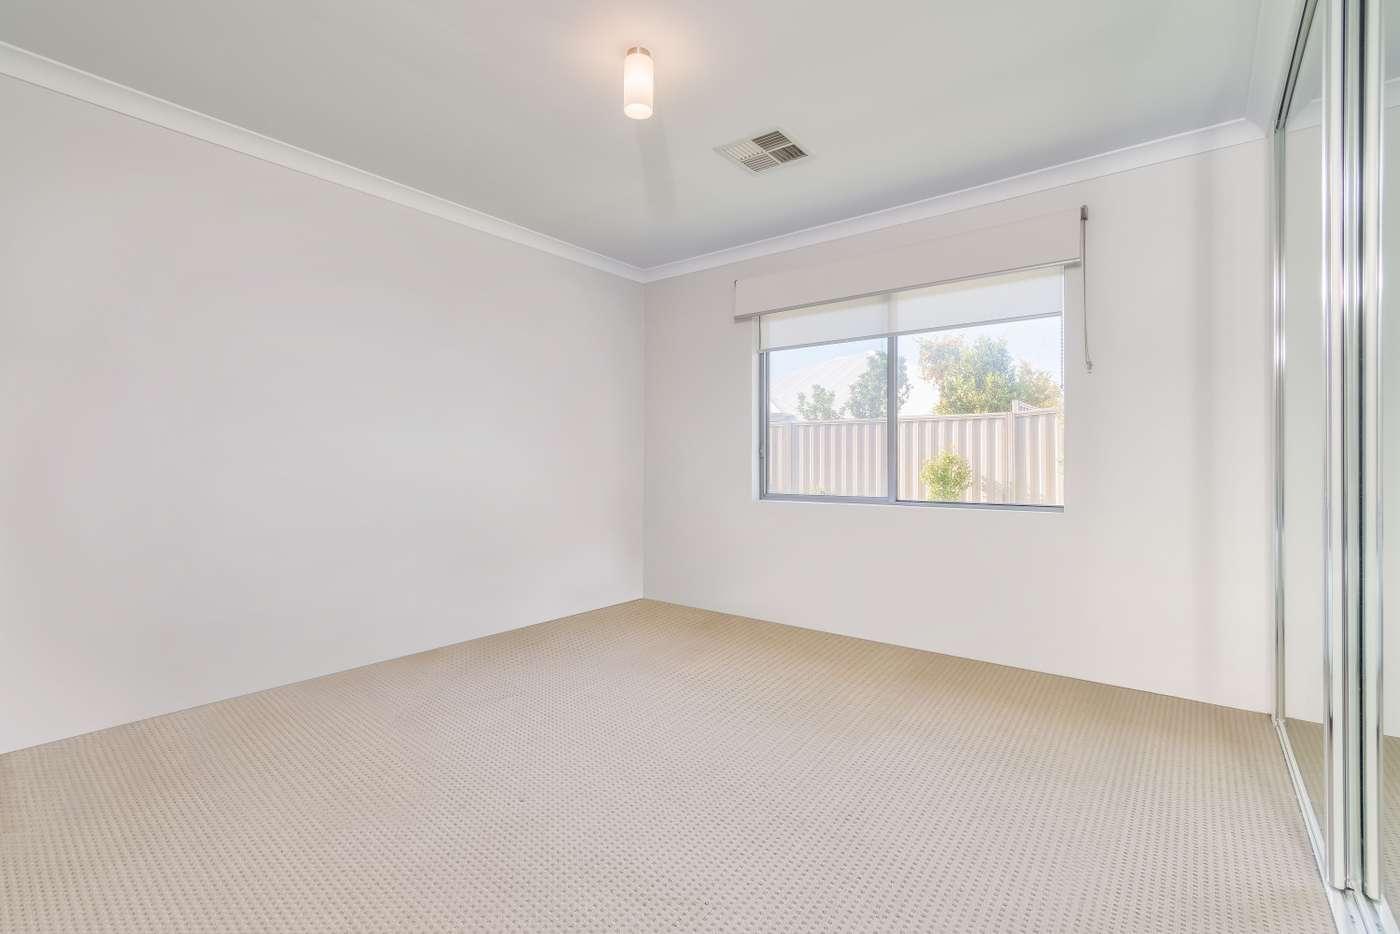 Sixth view of Homely house listing, 10 Clavata Road, Beeliar WA 6164